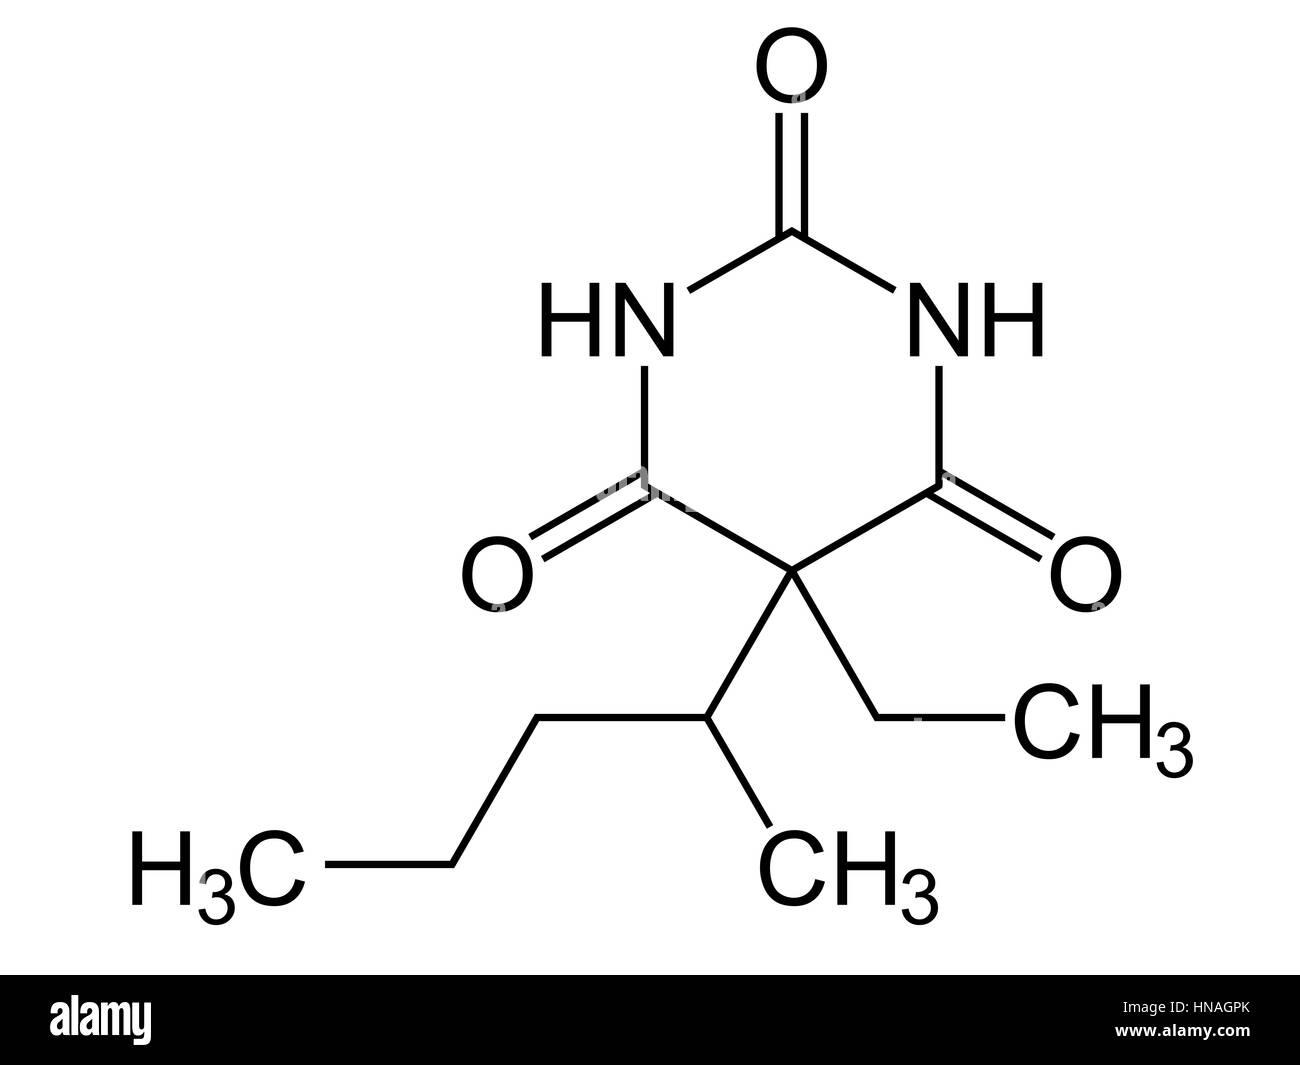 Pentobarbital (Pentobarbitone ). Structural formula. This short-acting barbiturate has sedative, hypnotic, preanesthetic - Stock Image